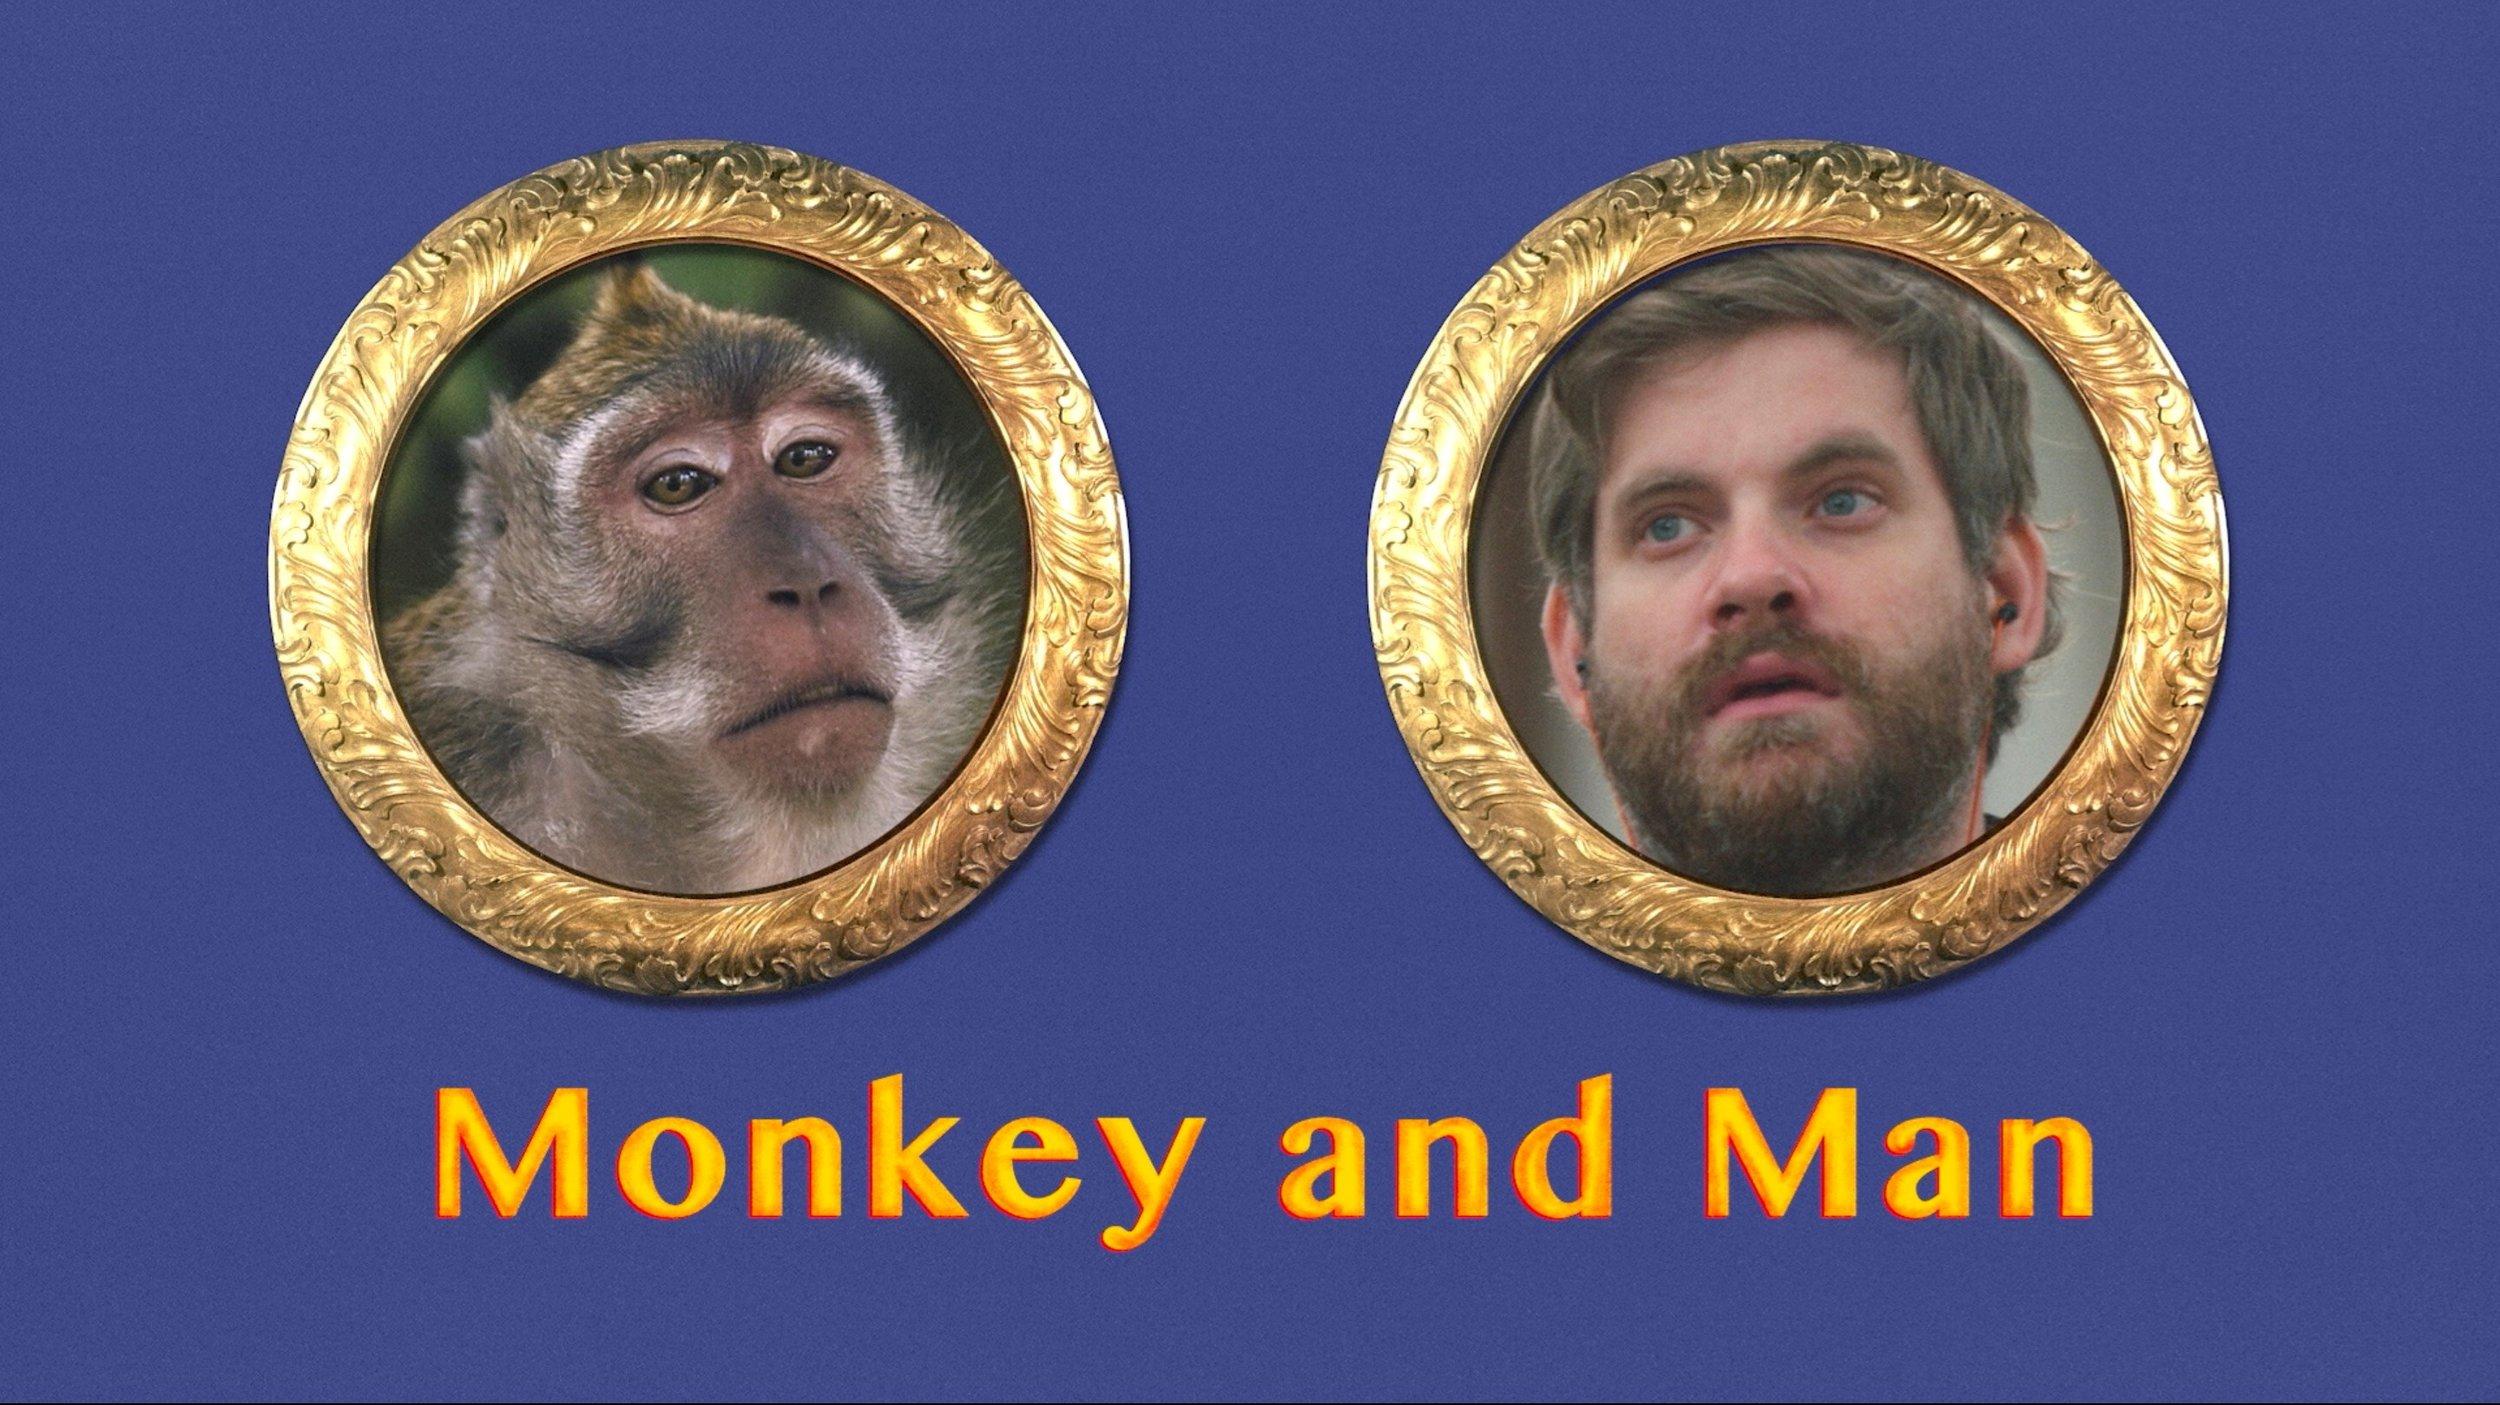 Monkey_and_Man card.jpg